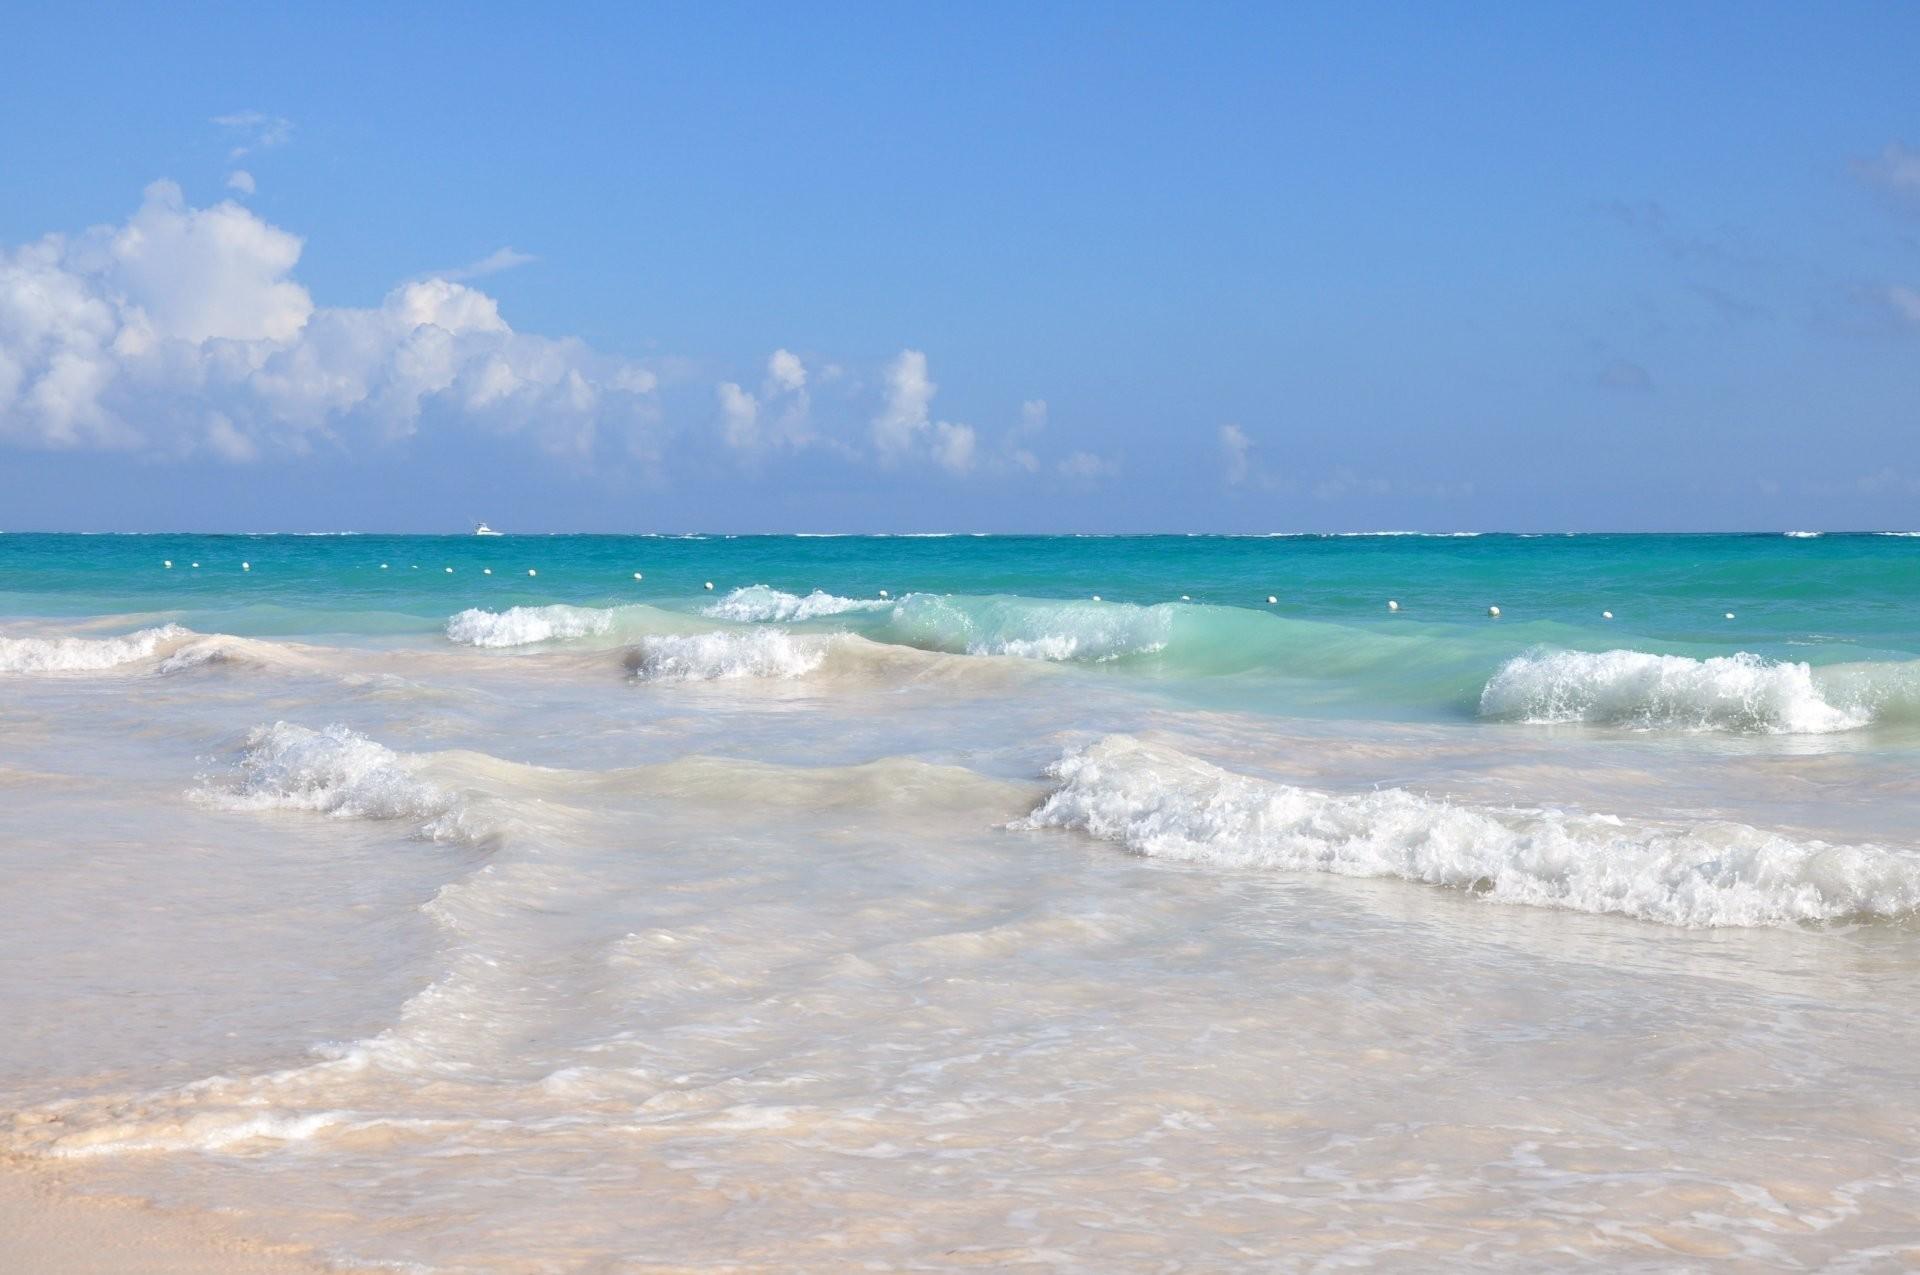 ocean resort dominican republic sea water waves sand beach sports relax